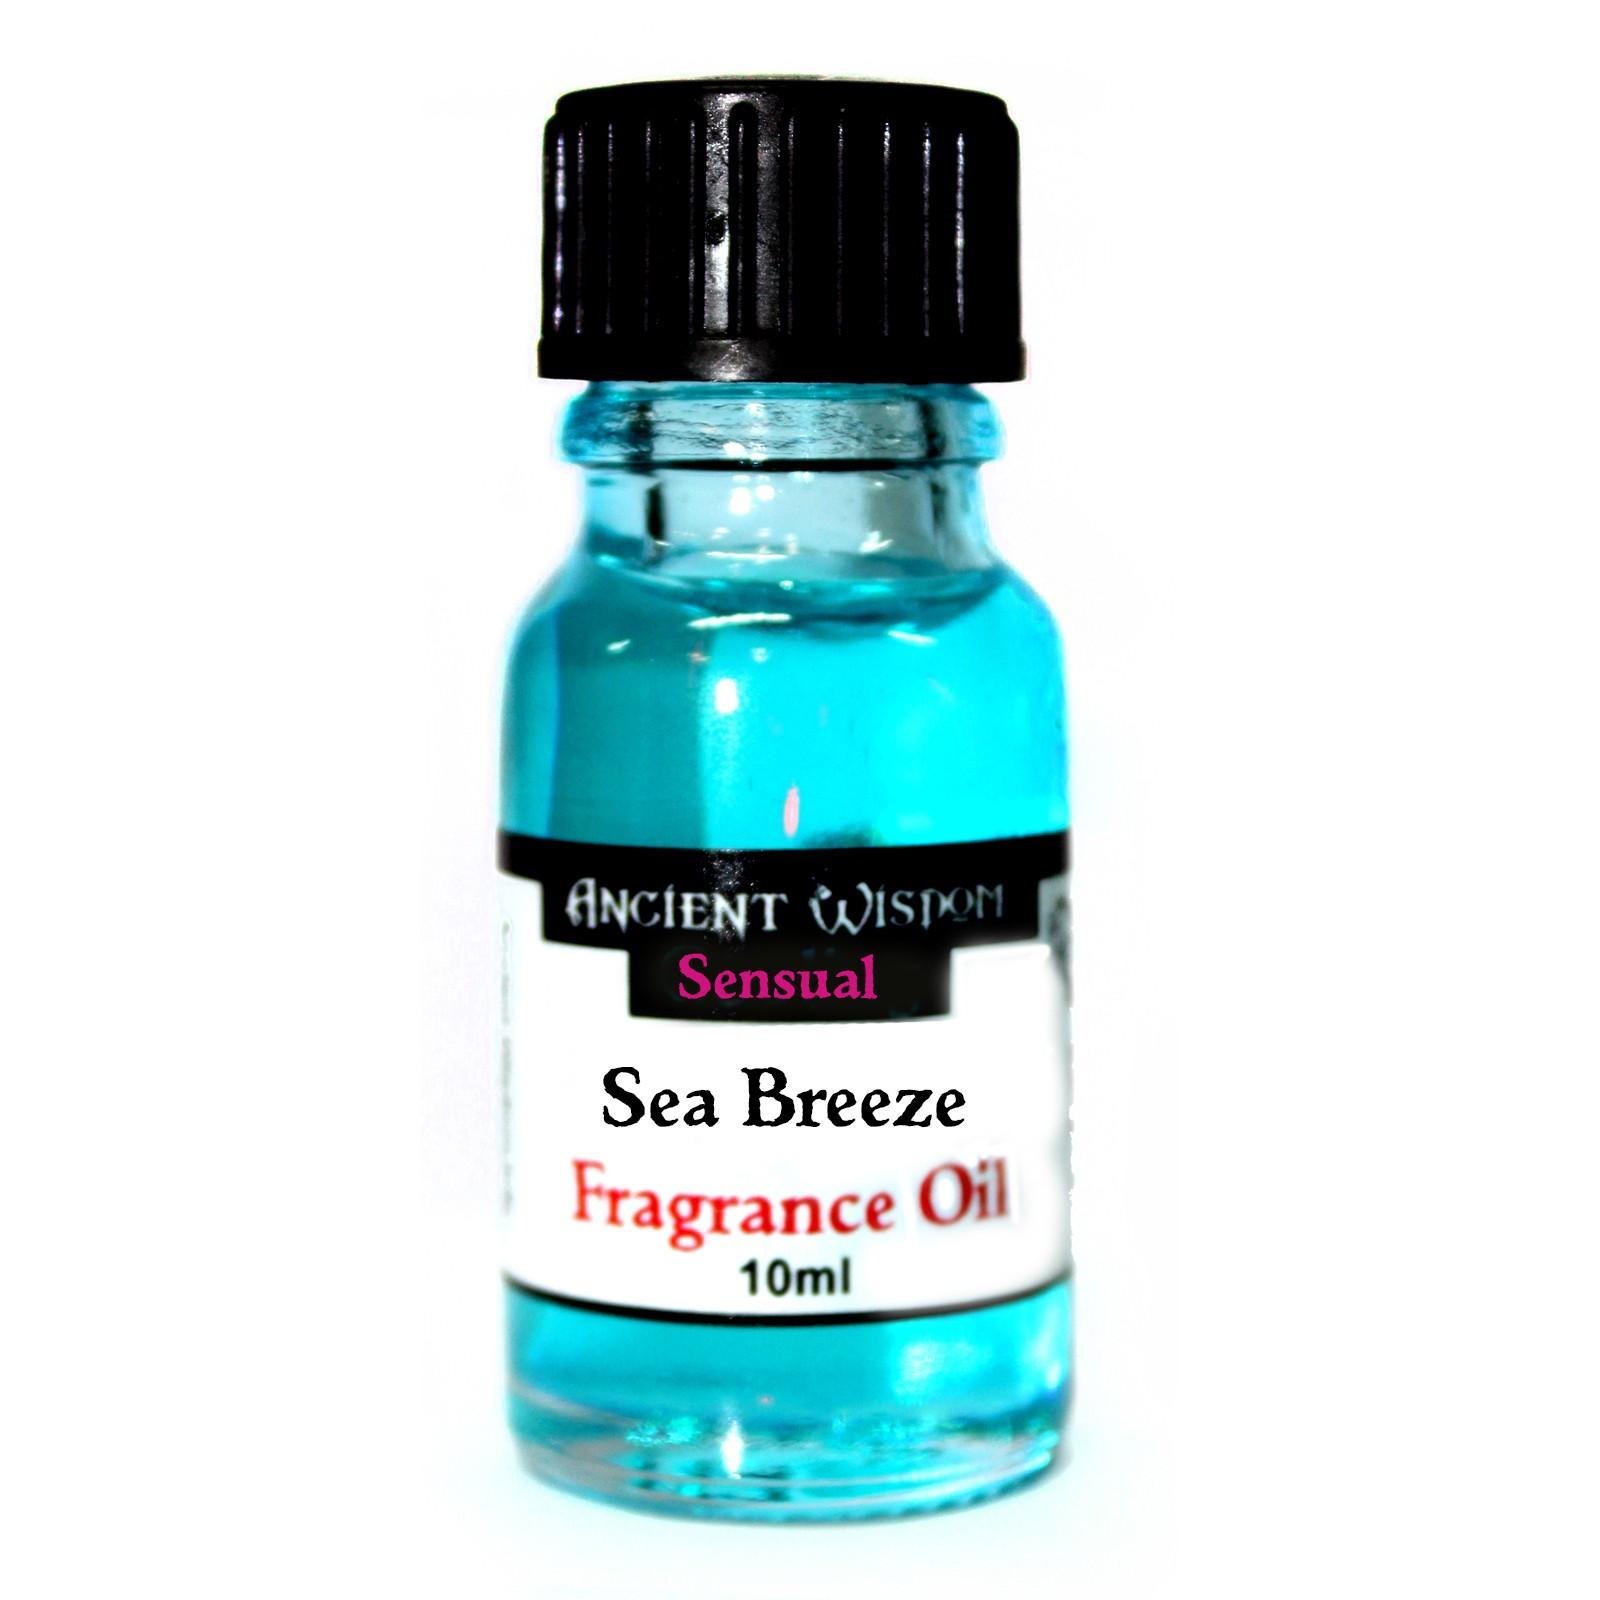 10ml Sea Breeze Fragrance Oil